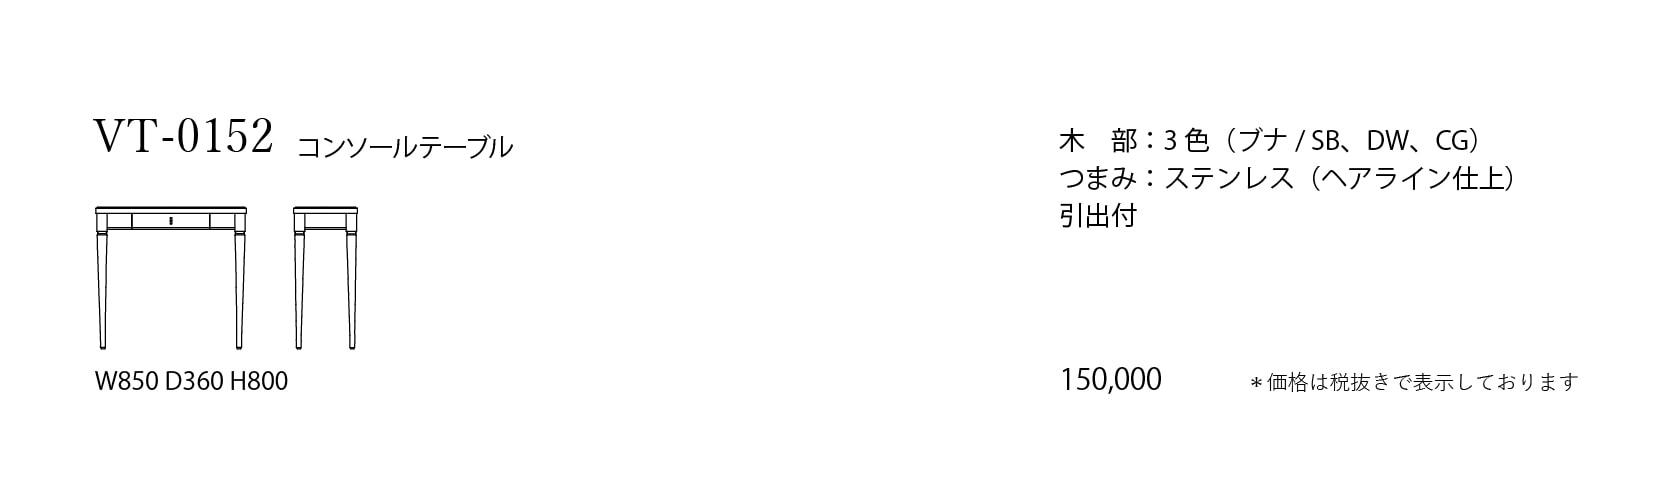 VT-0152 Price List